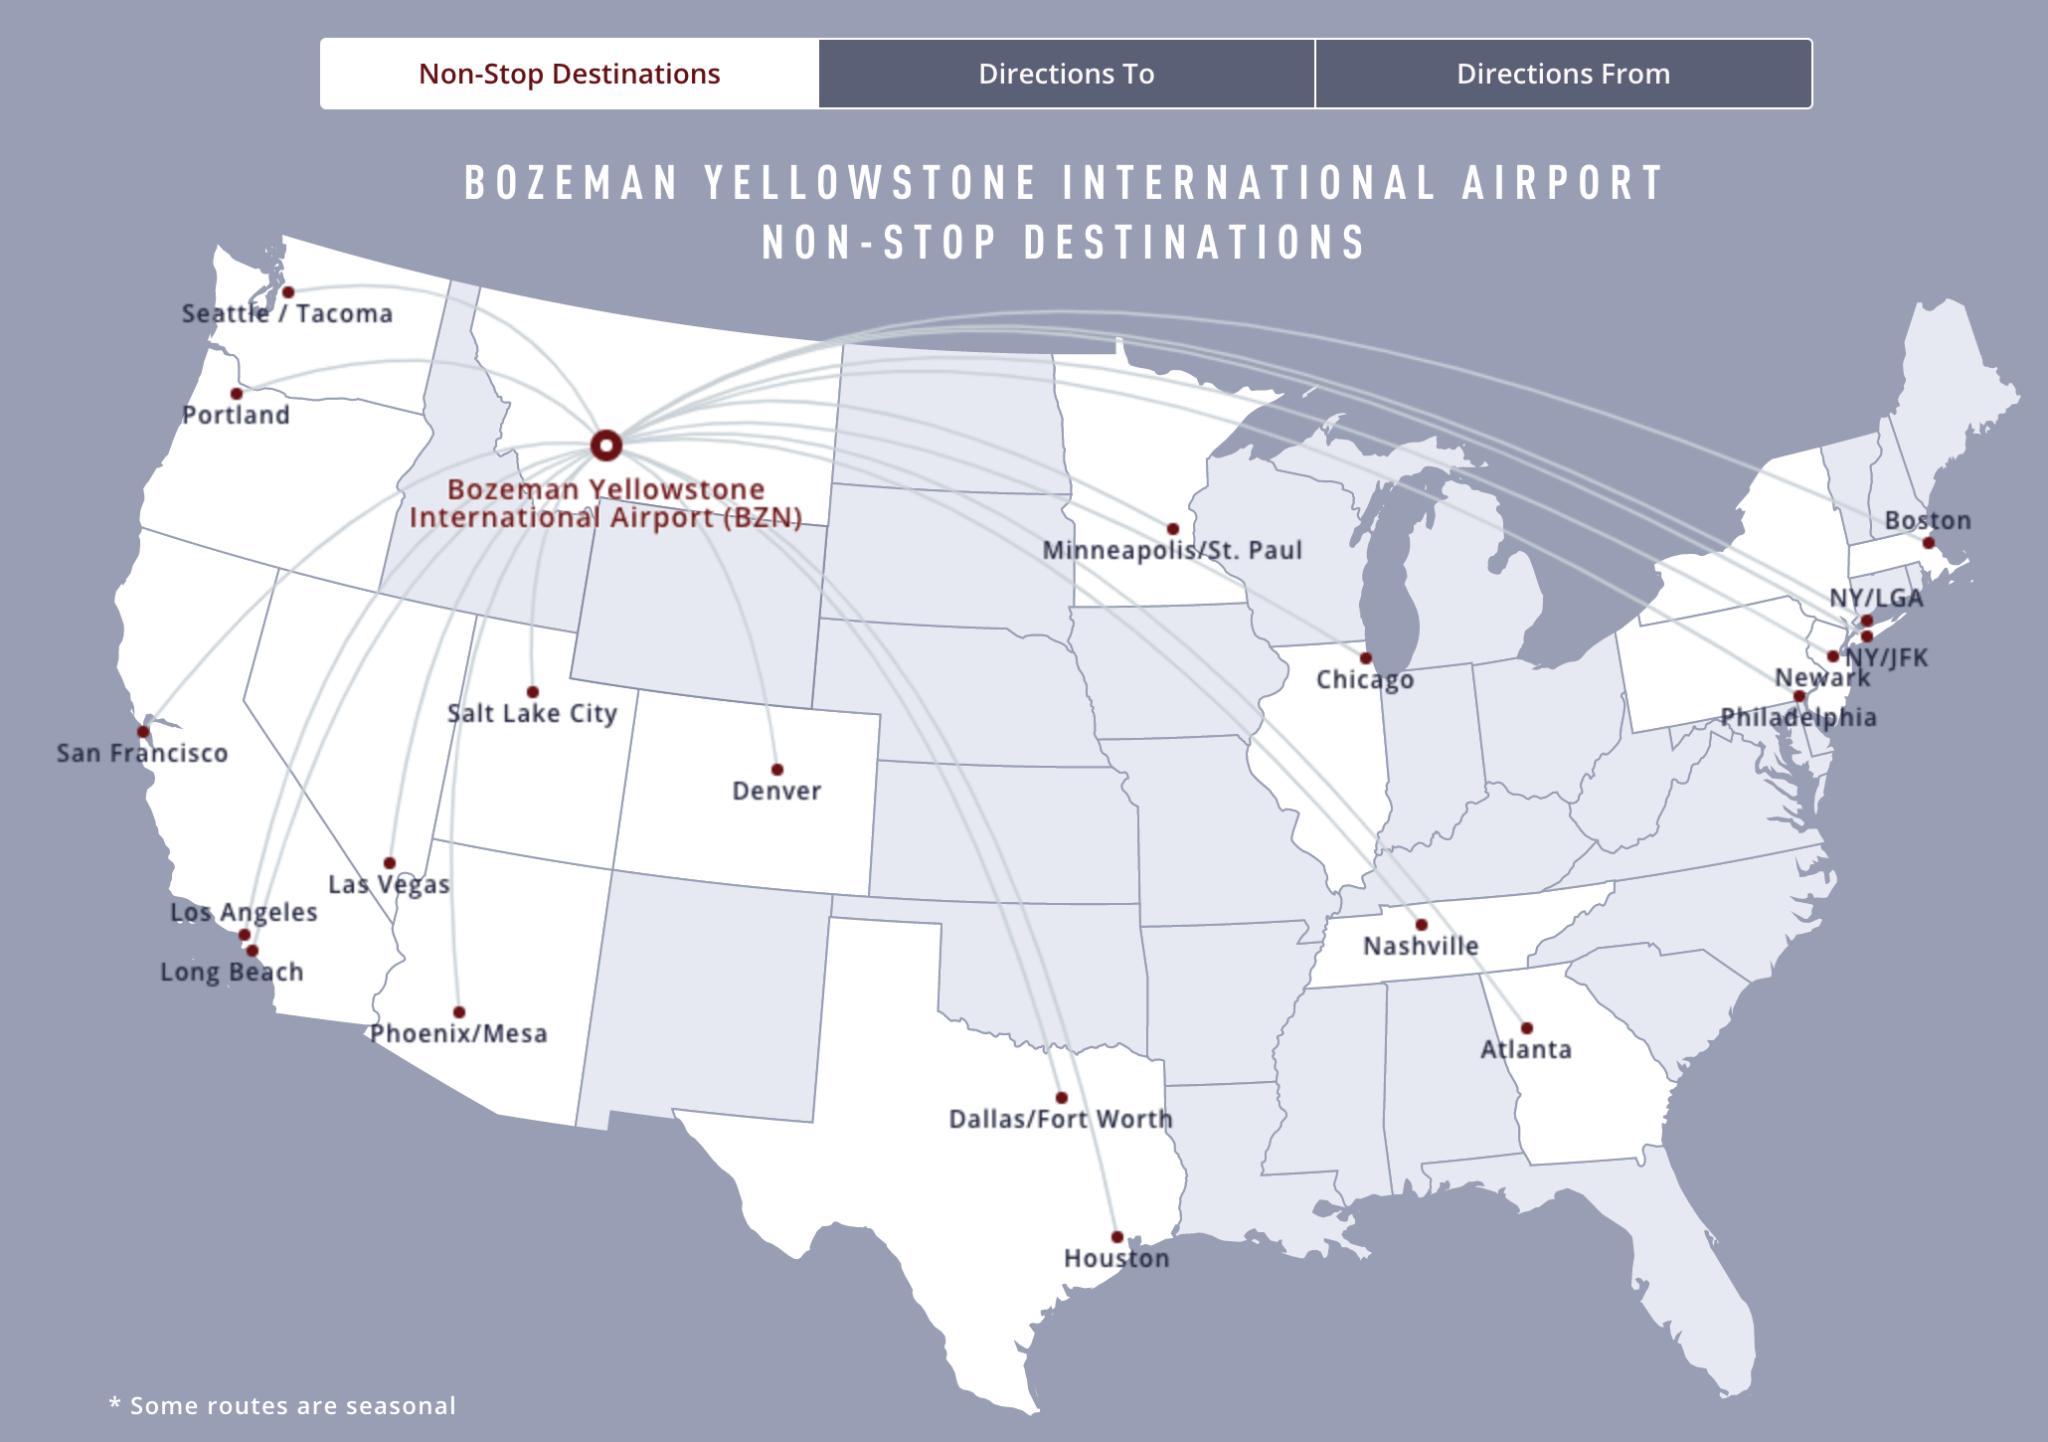 (Infographic courtesy Bozeman Yellowstone International Airport)